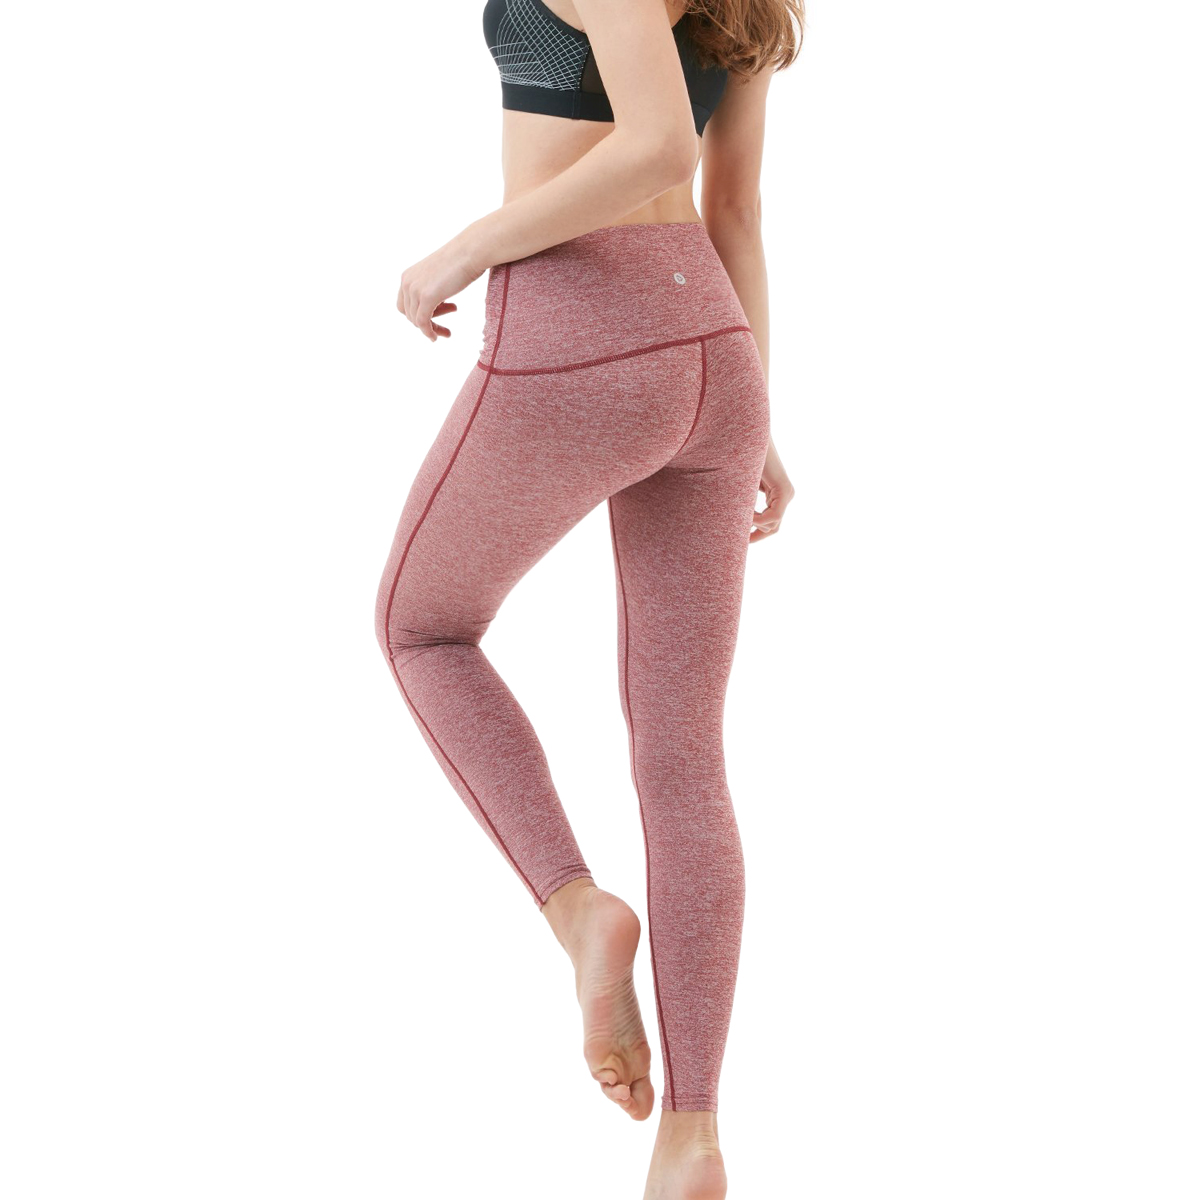 thumbnail 101 - TSLA Tesla FYP42 Women's High-Waisted Ultra-Stretch Tummy Control Yoga Pants